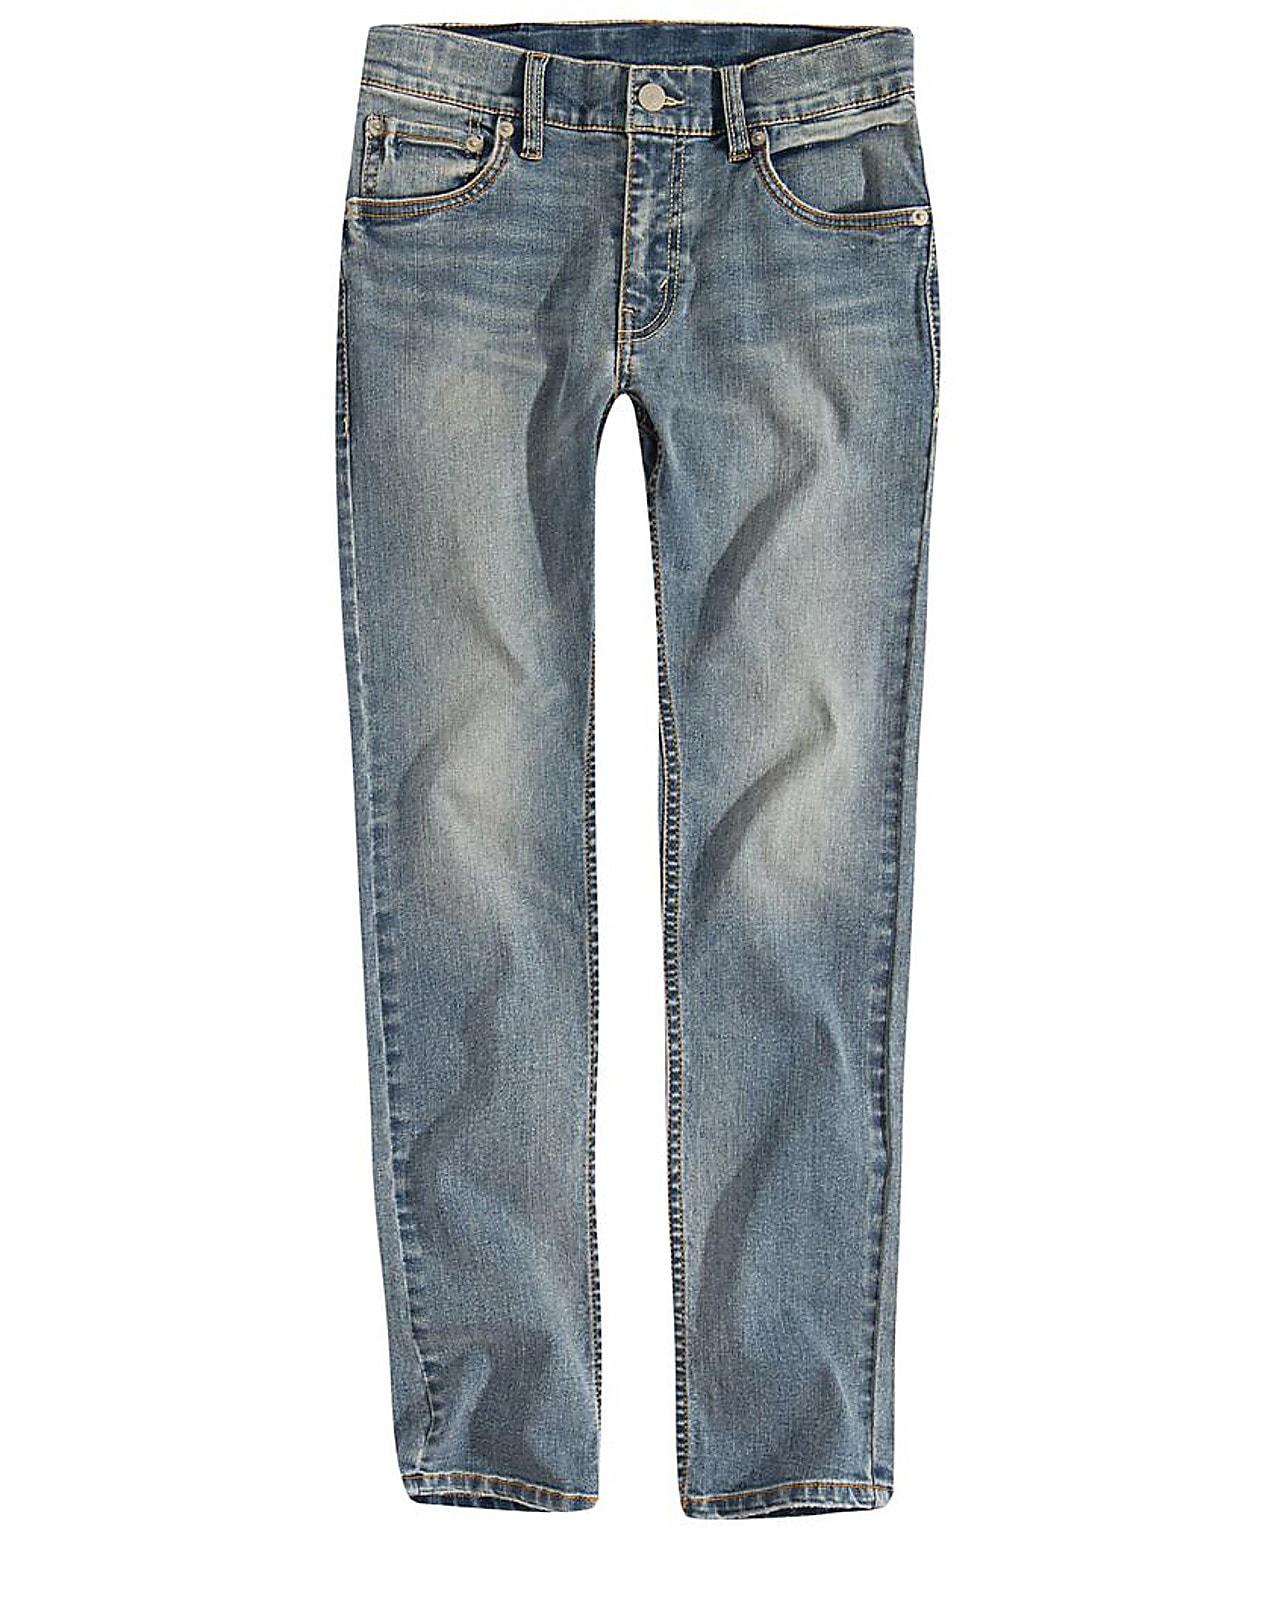 Image of Levis 510 jeans, Jean, Burbank